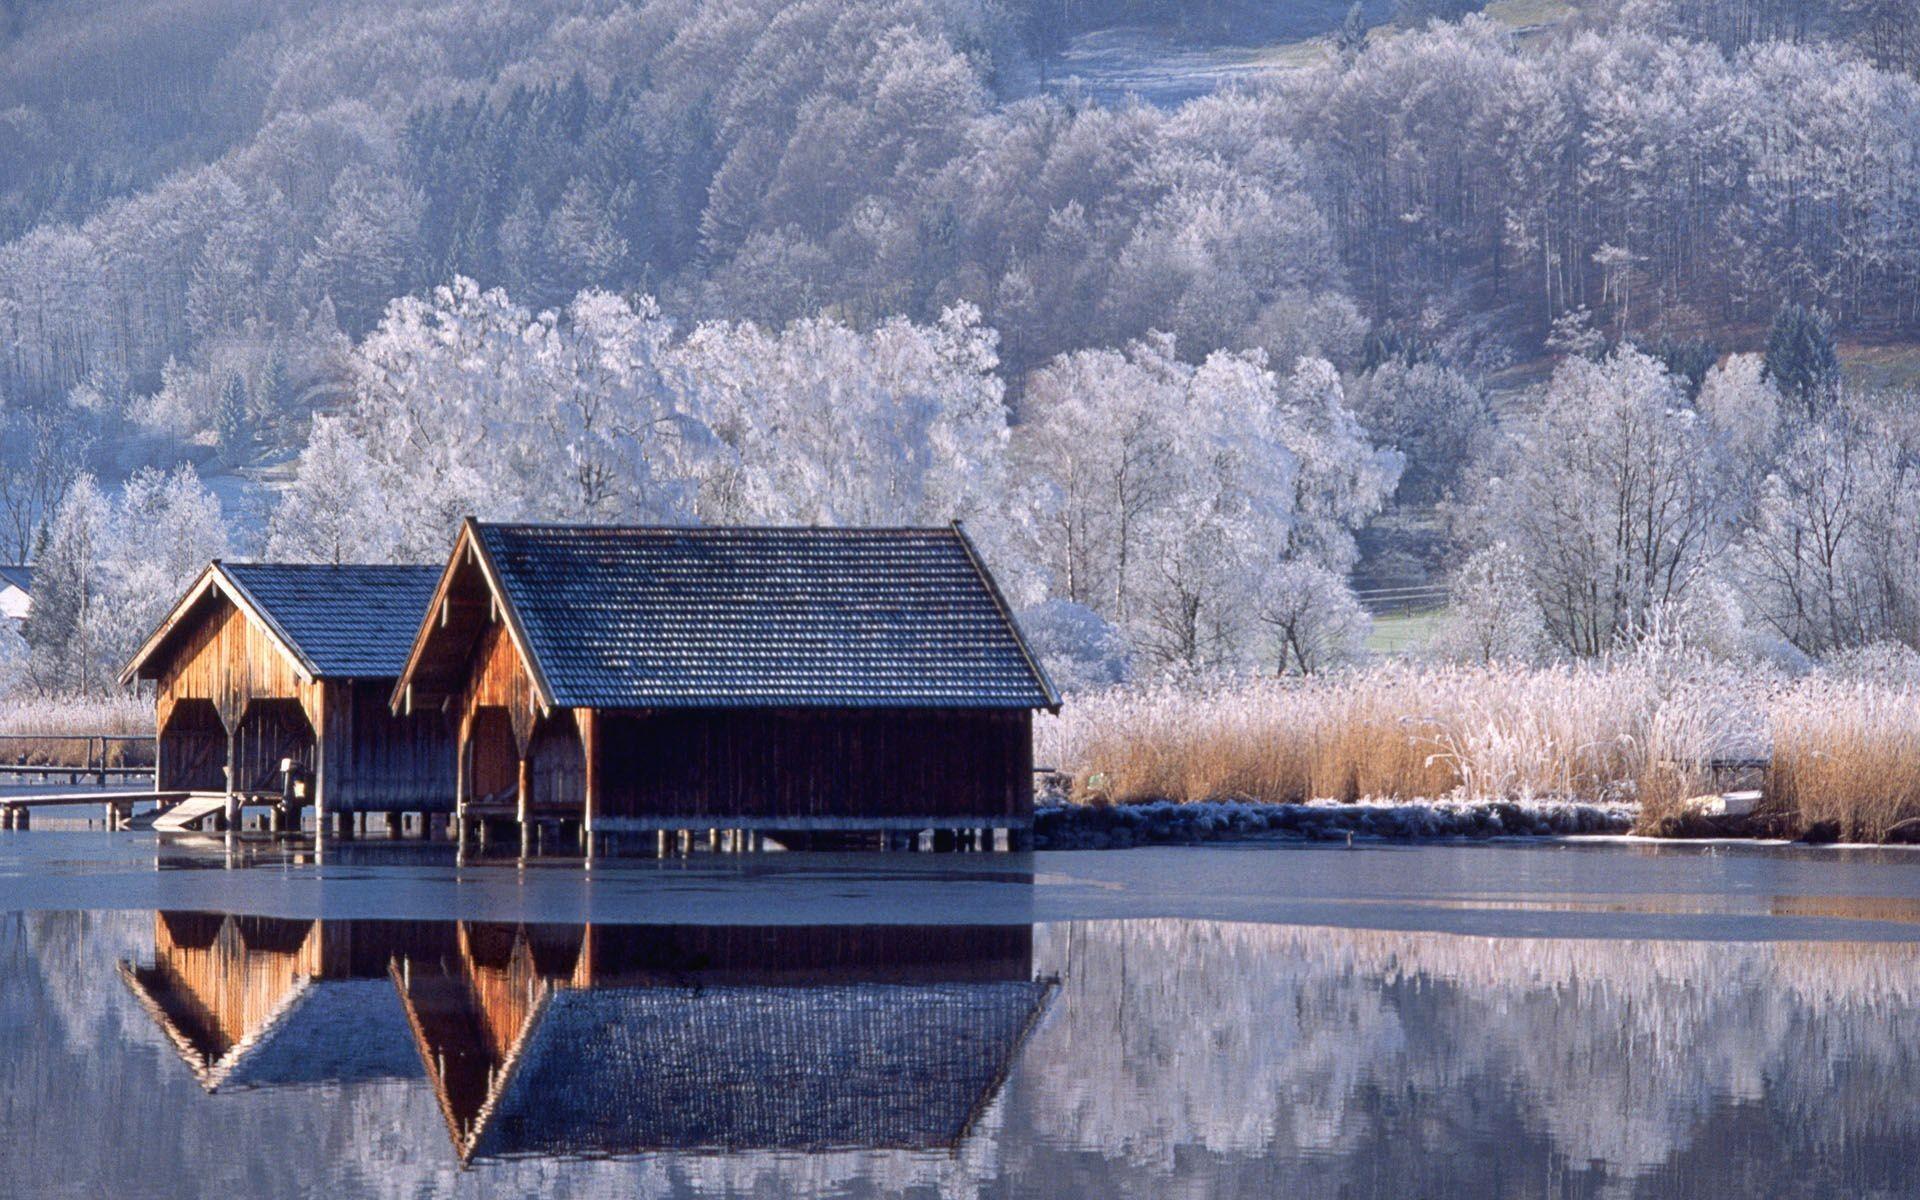 Falling Snow Wallpaper Download Beautiful Snow Wallpapers 183 ① Wallpapertag